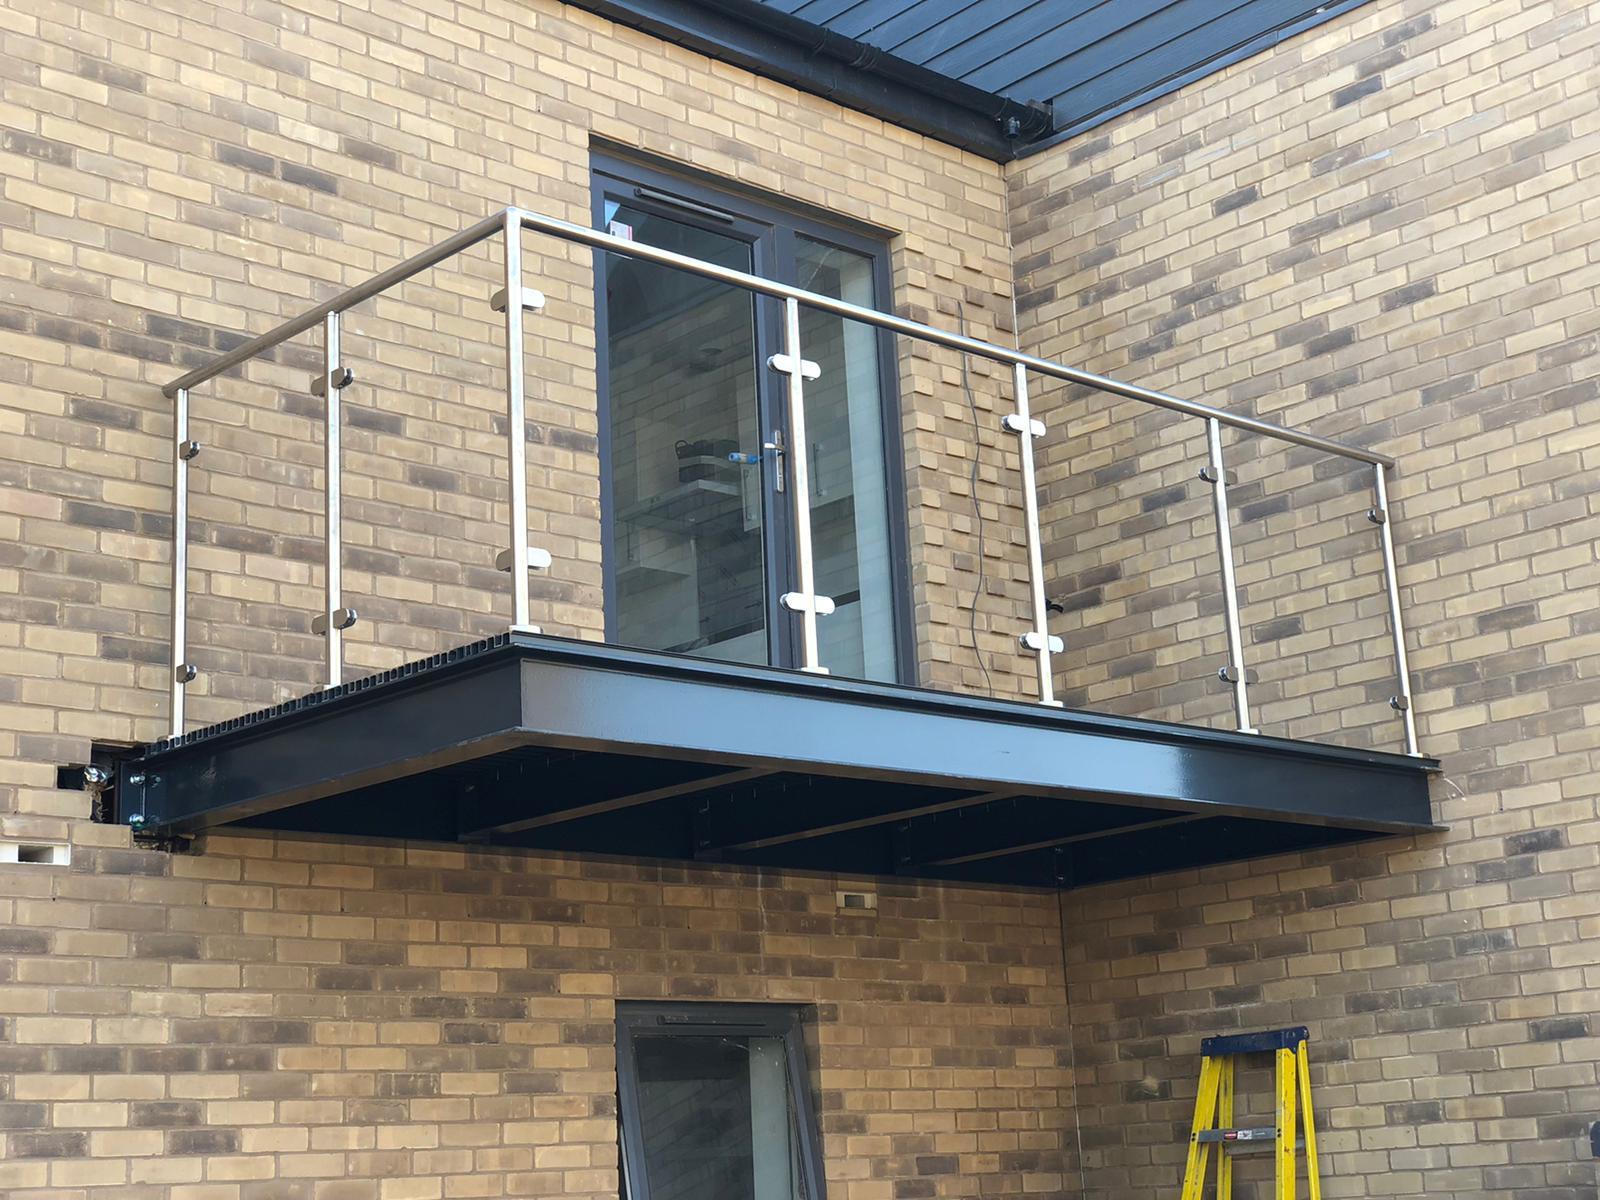 newbuild commercial balconies fabrication Juliette balcony